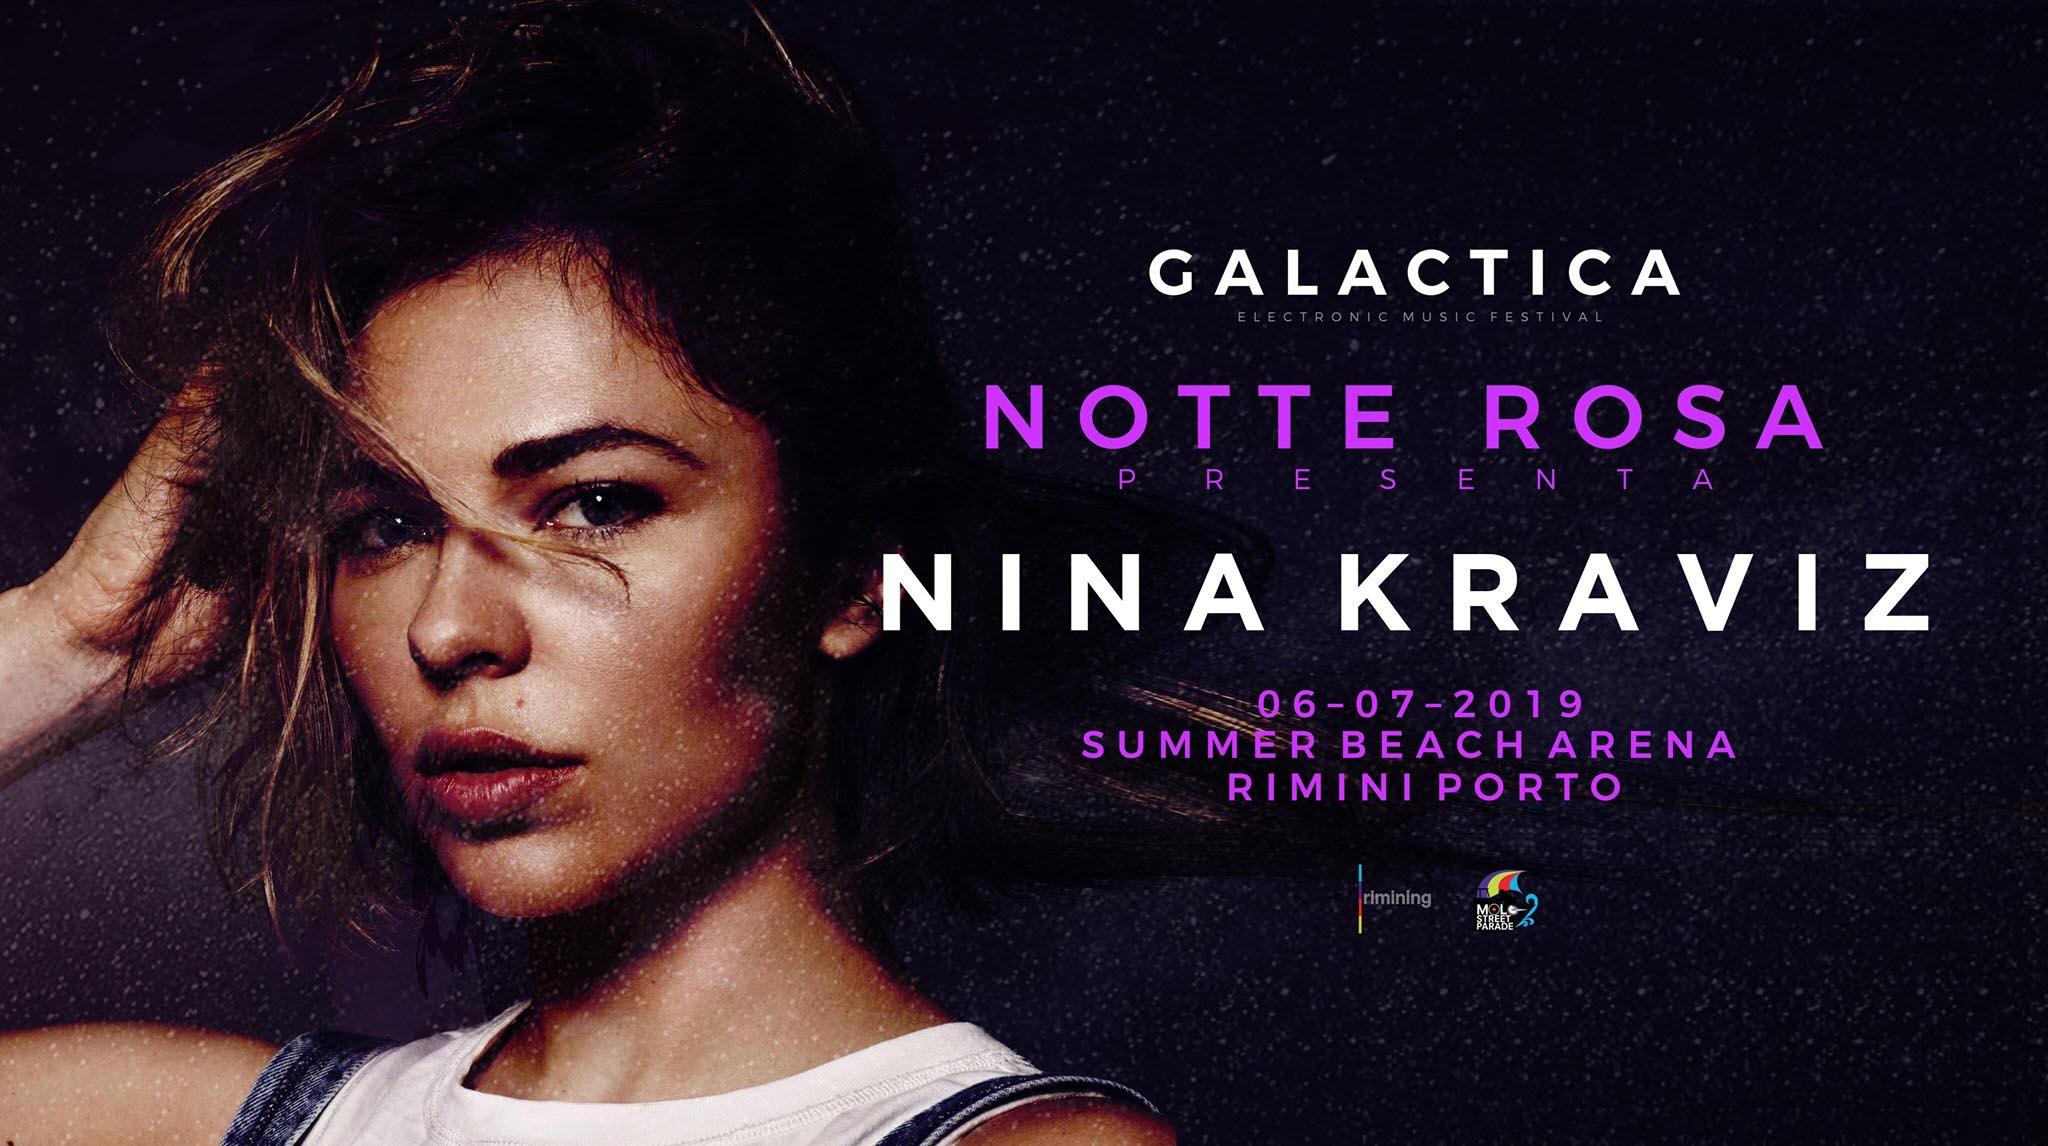 Nina Kraviz Rimini  Summer Beach Arena – Sabato 06 Luglio 2019 – Ticket – Biglietti 18app – Tavoli e  Pacchetti Hotel